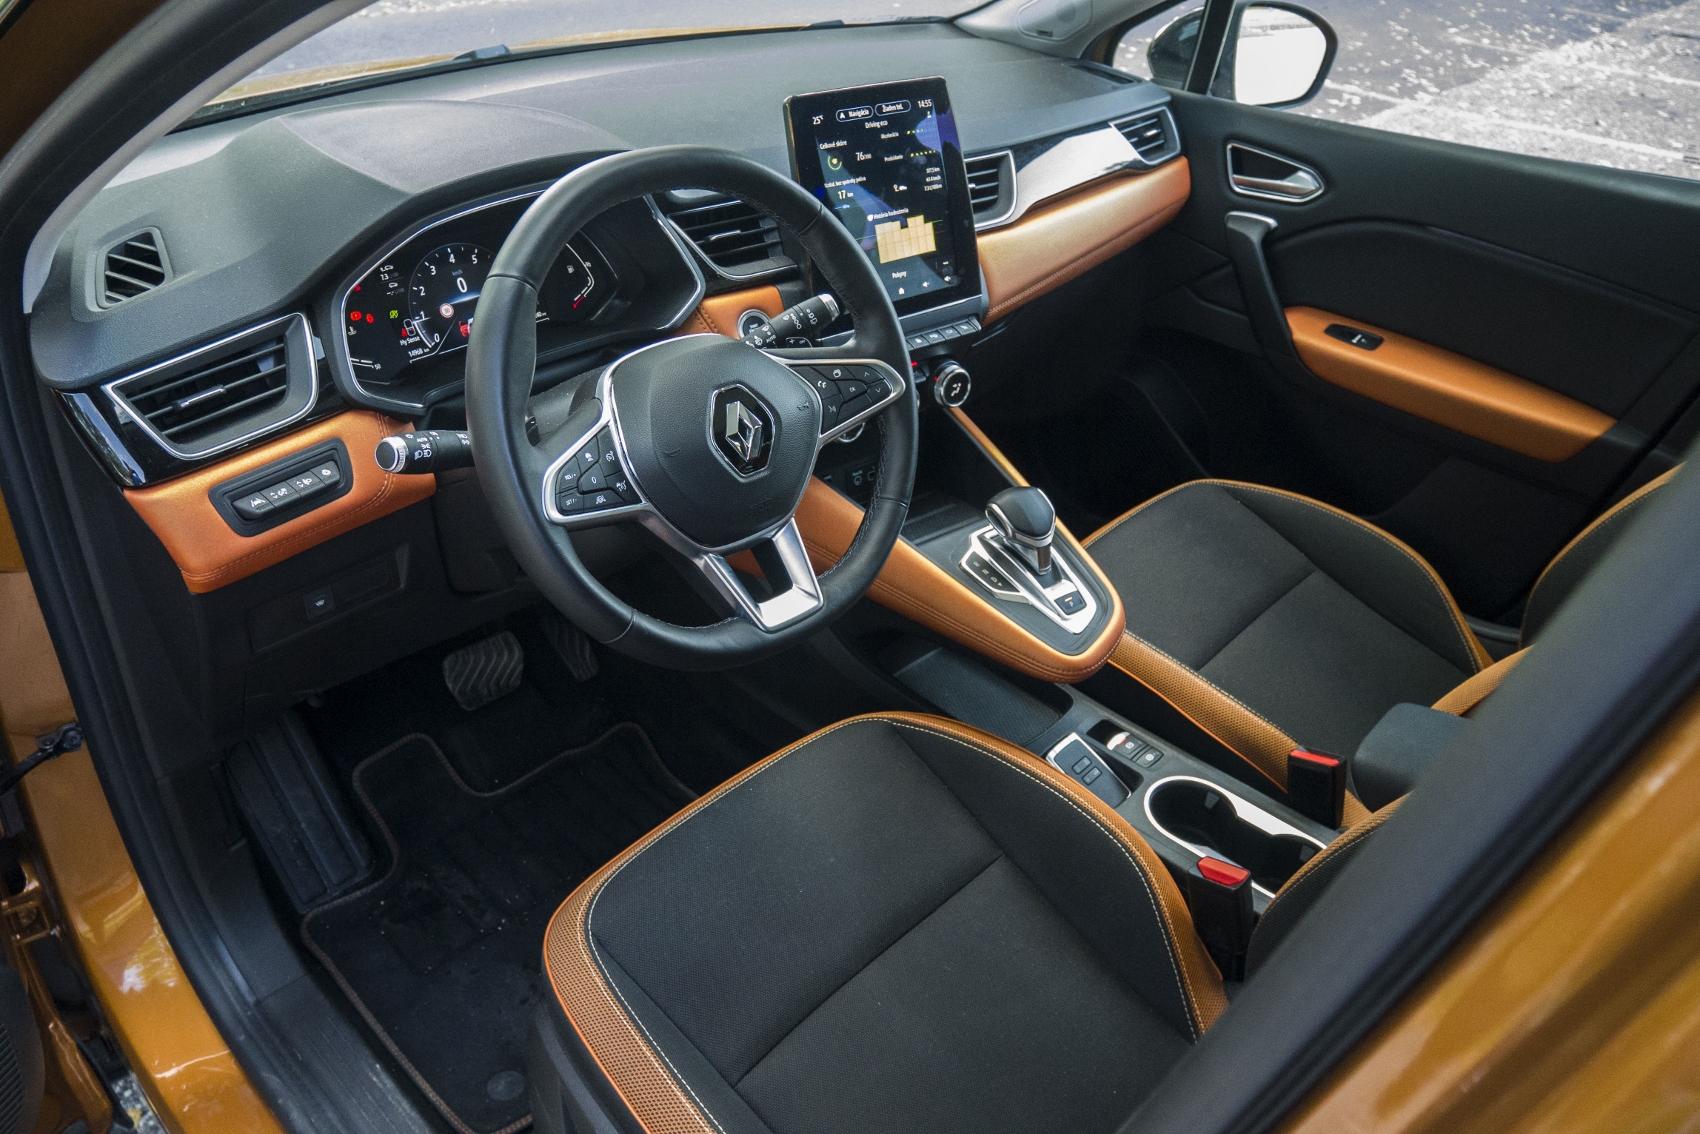 Test: V interiéri sa Renault Captur tvári ako o triedu drahšie auto LsHuqF9Etj renault-captur-20